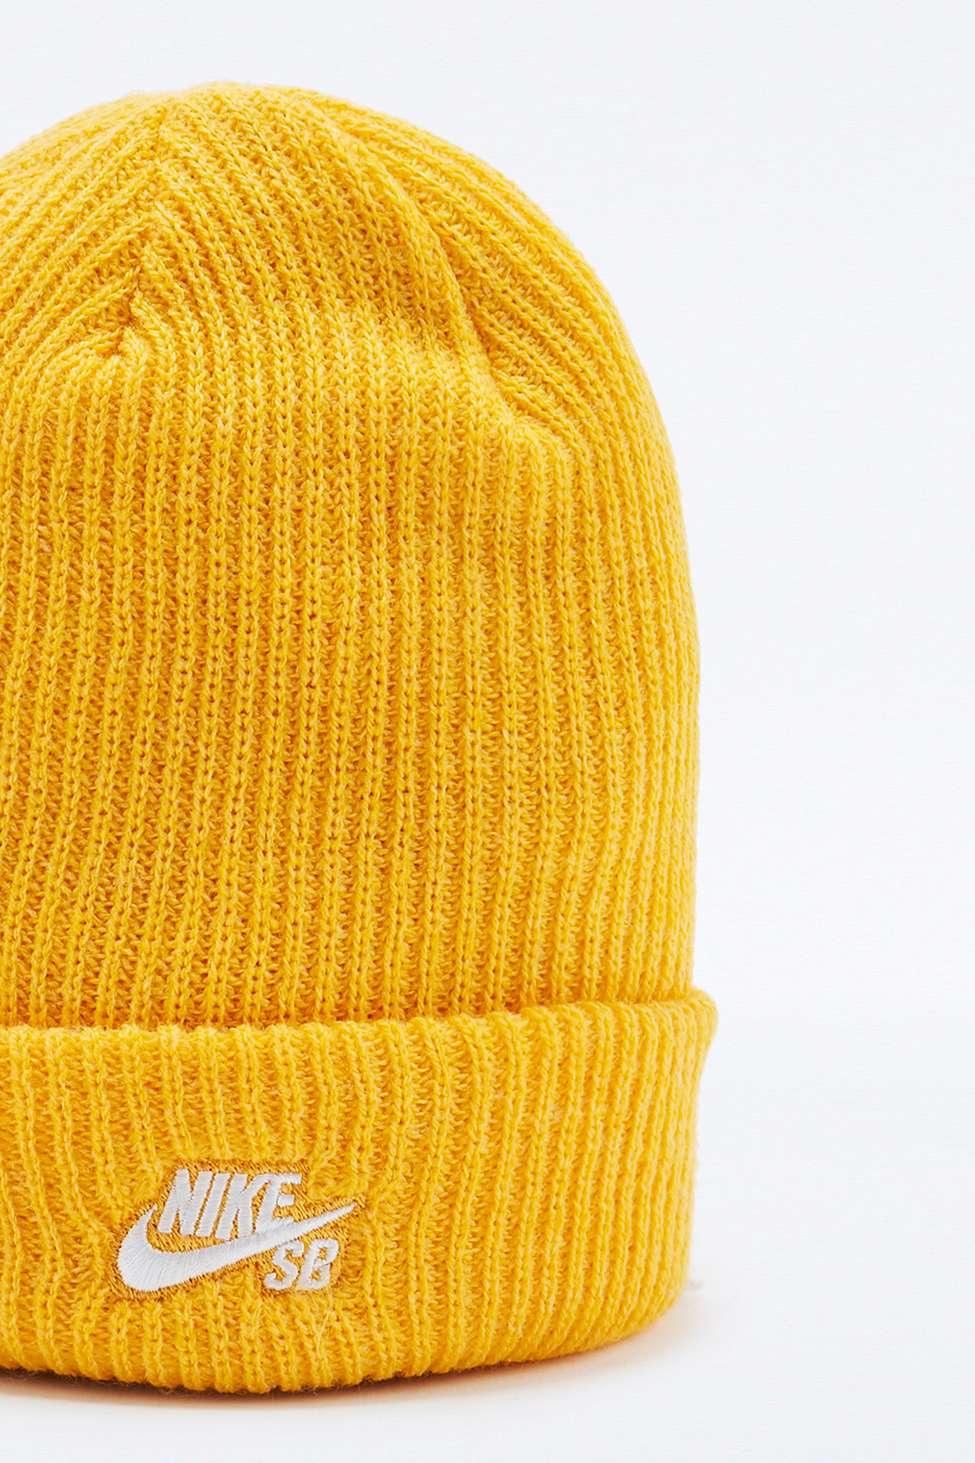 1339d344f4de Nike Fisherman Yellow Beanie in Yellow for Men - Lyst